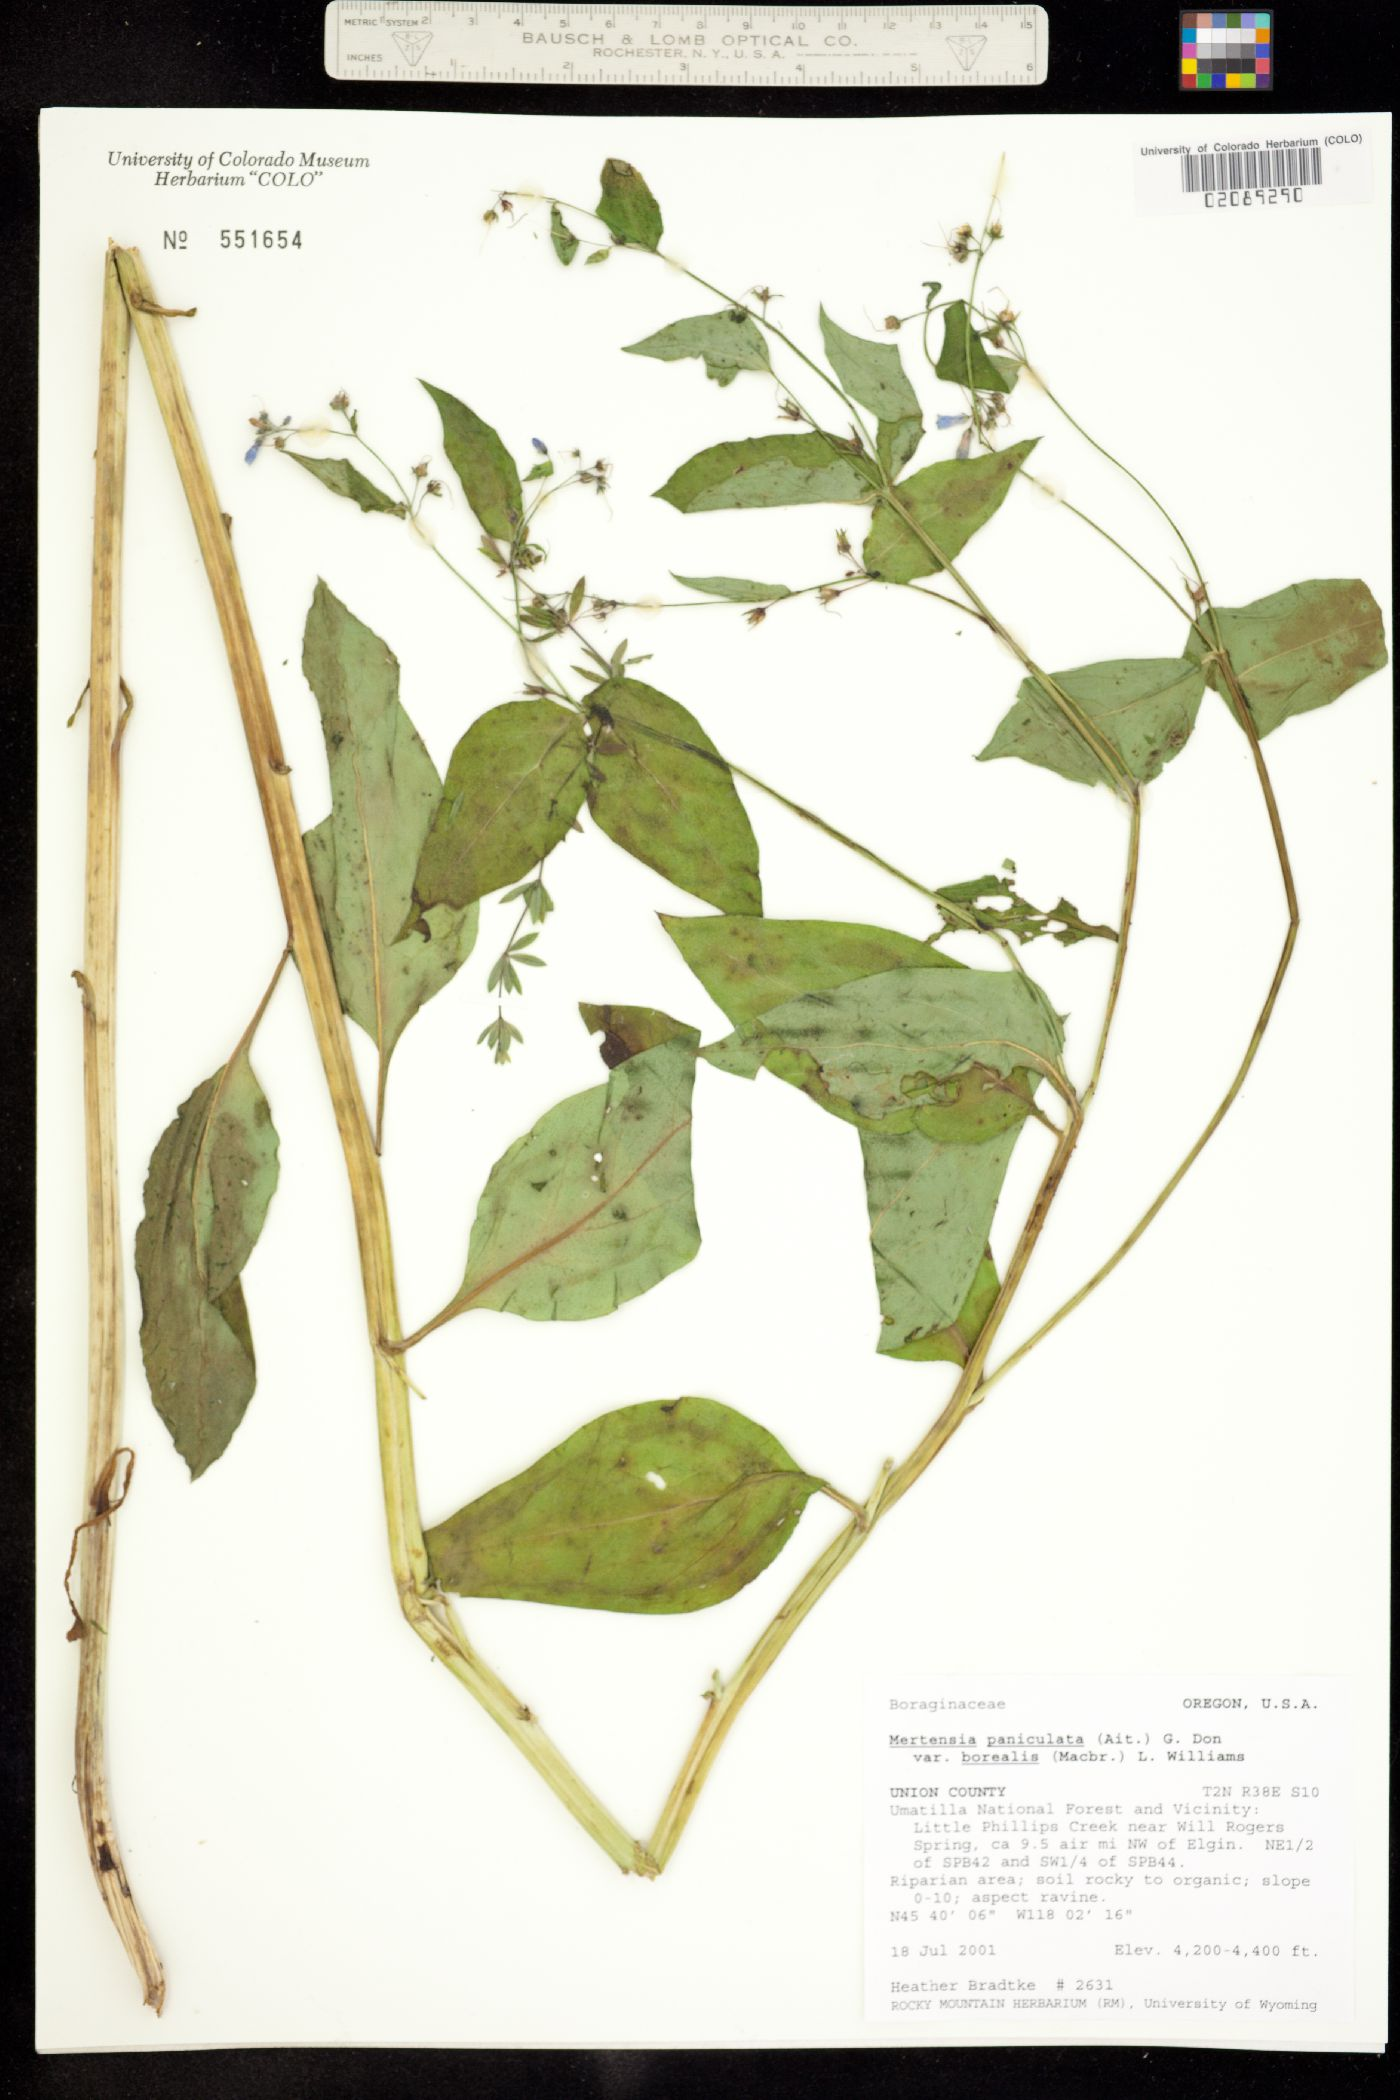 Mertensia paniculata var. borealis image